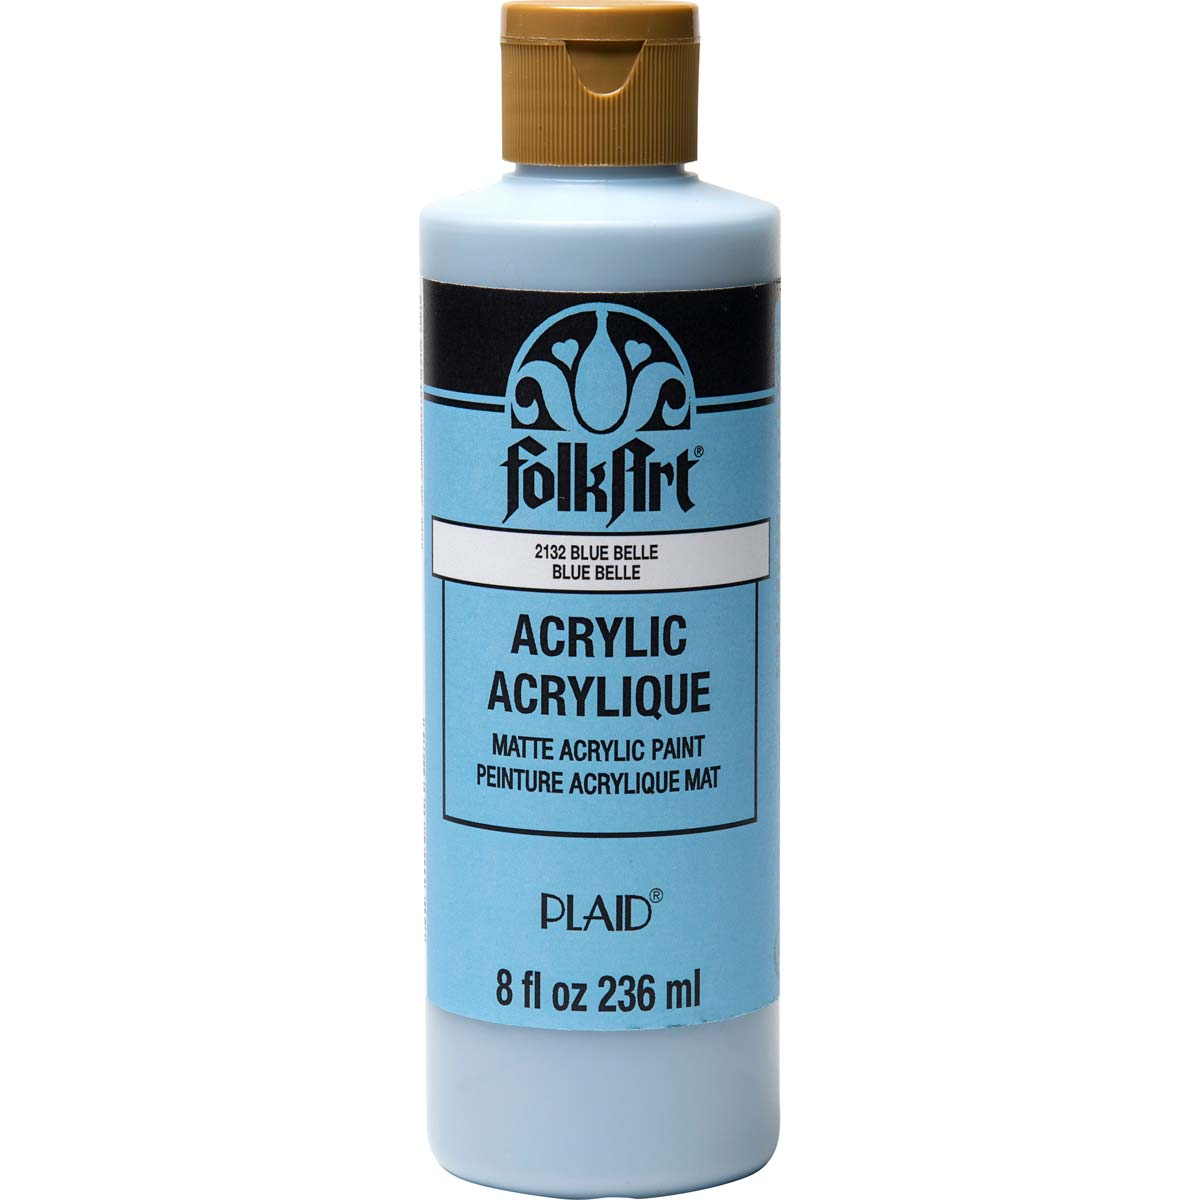 FolkArt ® Acrylic Colors - Blue Belle, 8 oz. - 2132